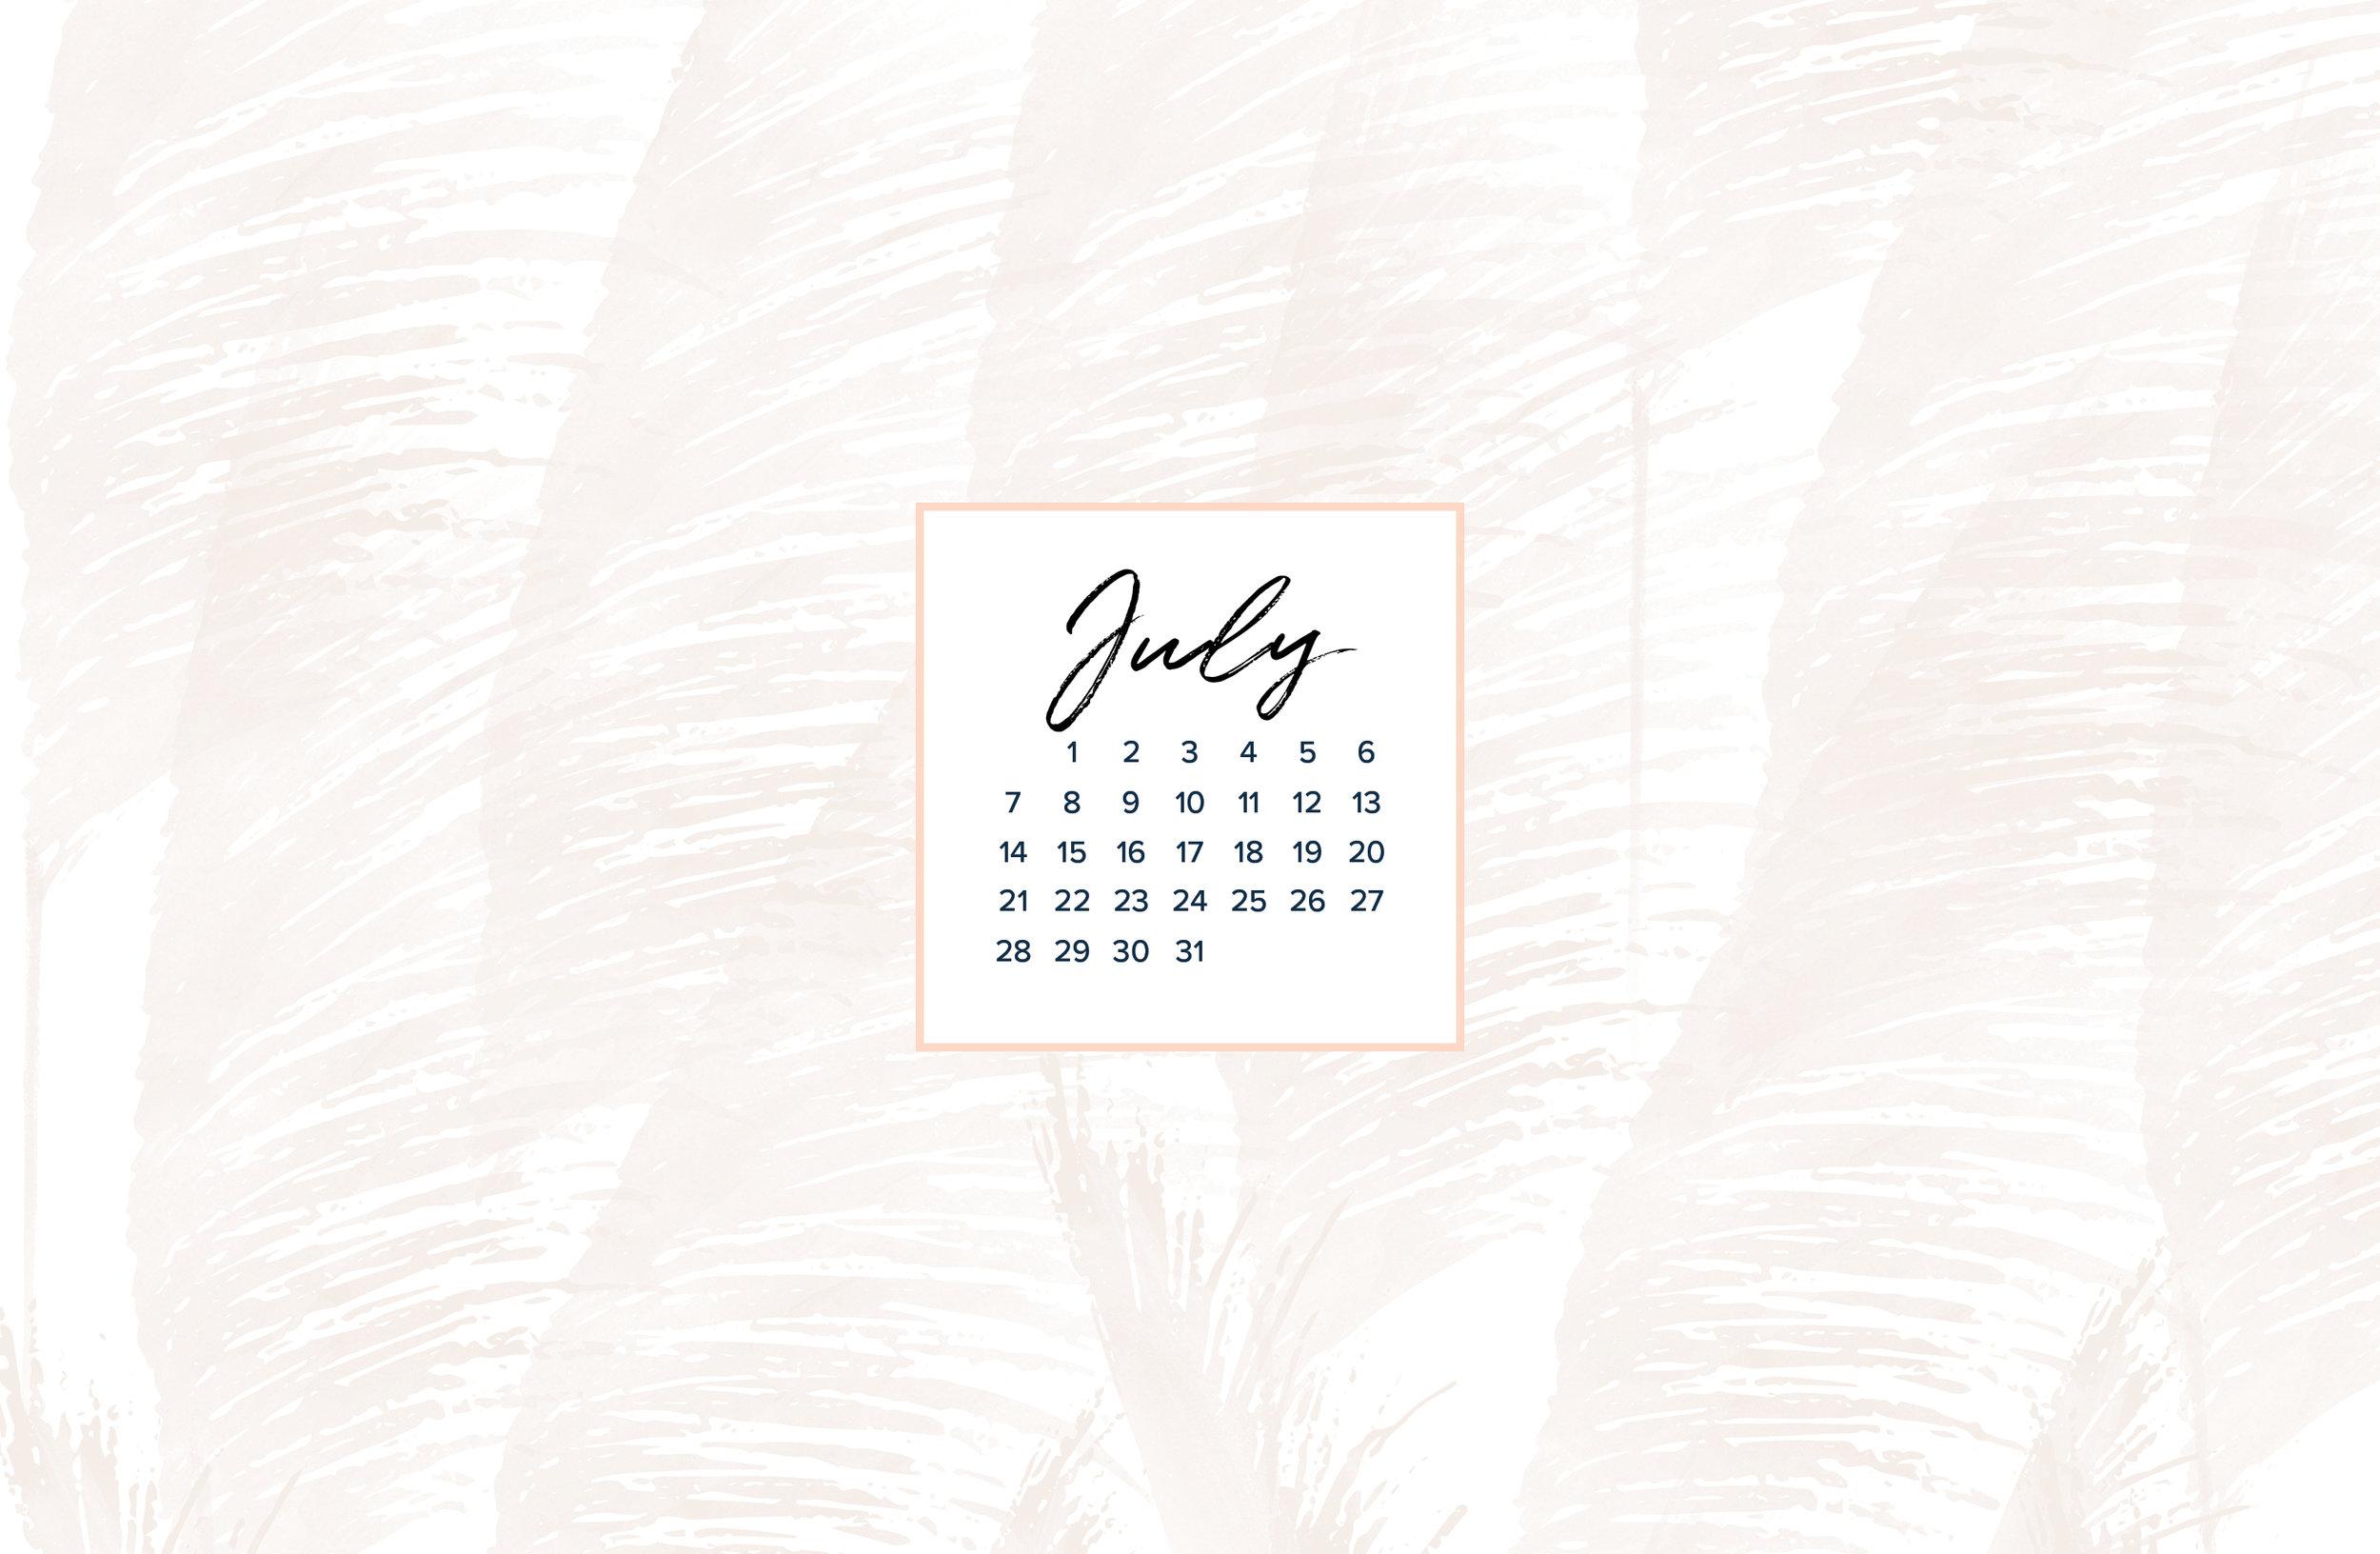 July_Summer_Freebies_4a.jpg